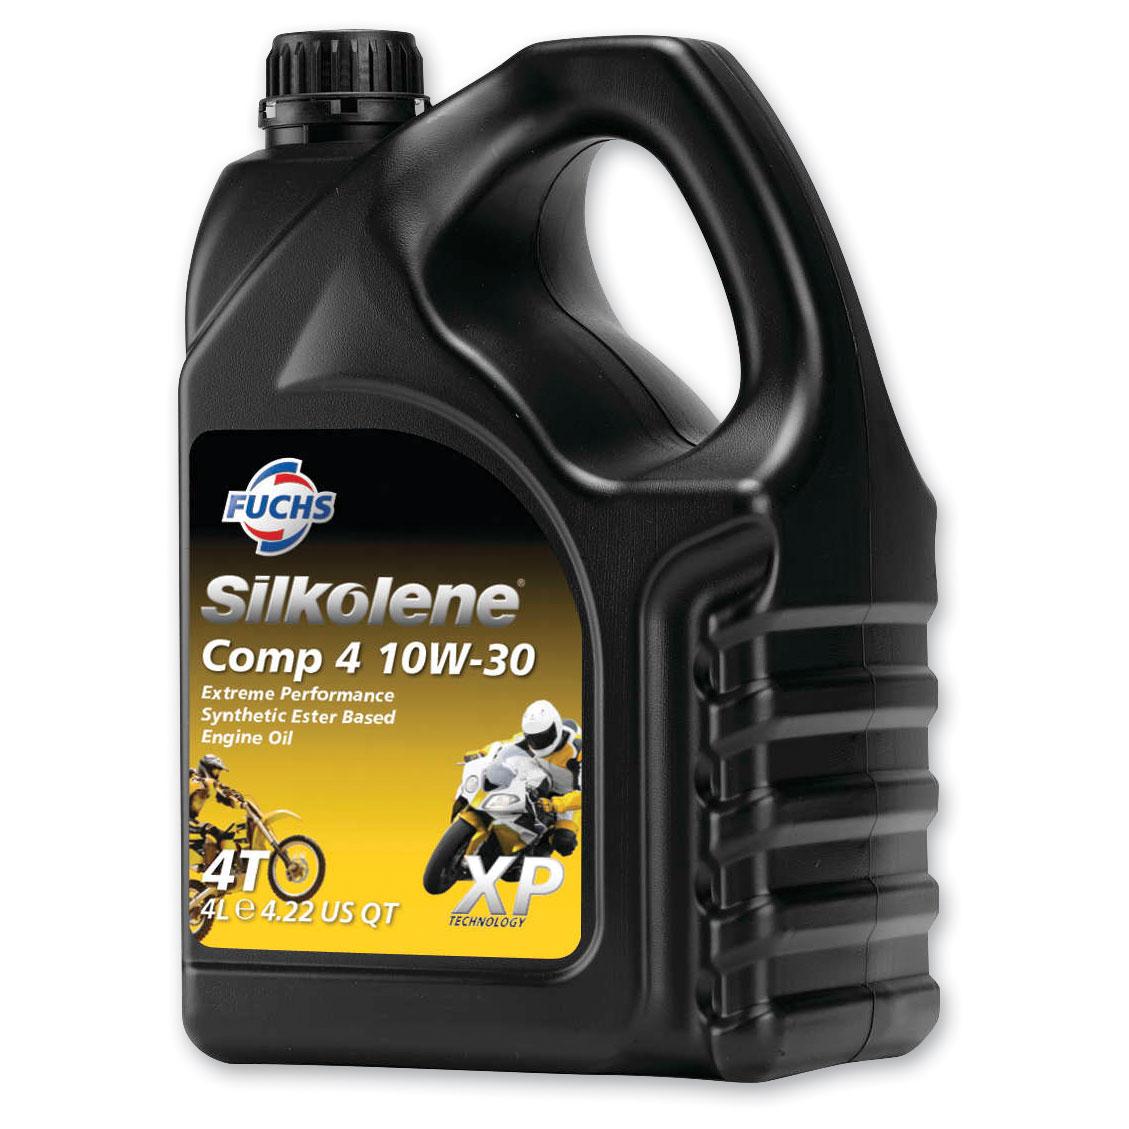 Silkolene Comp 4 XP 10W30 Engine Oil 4L